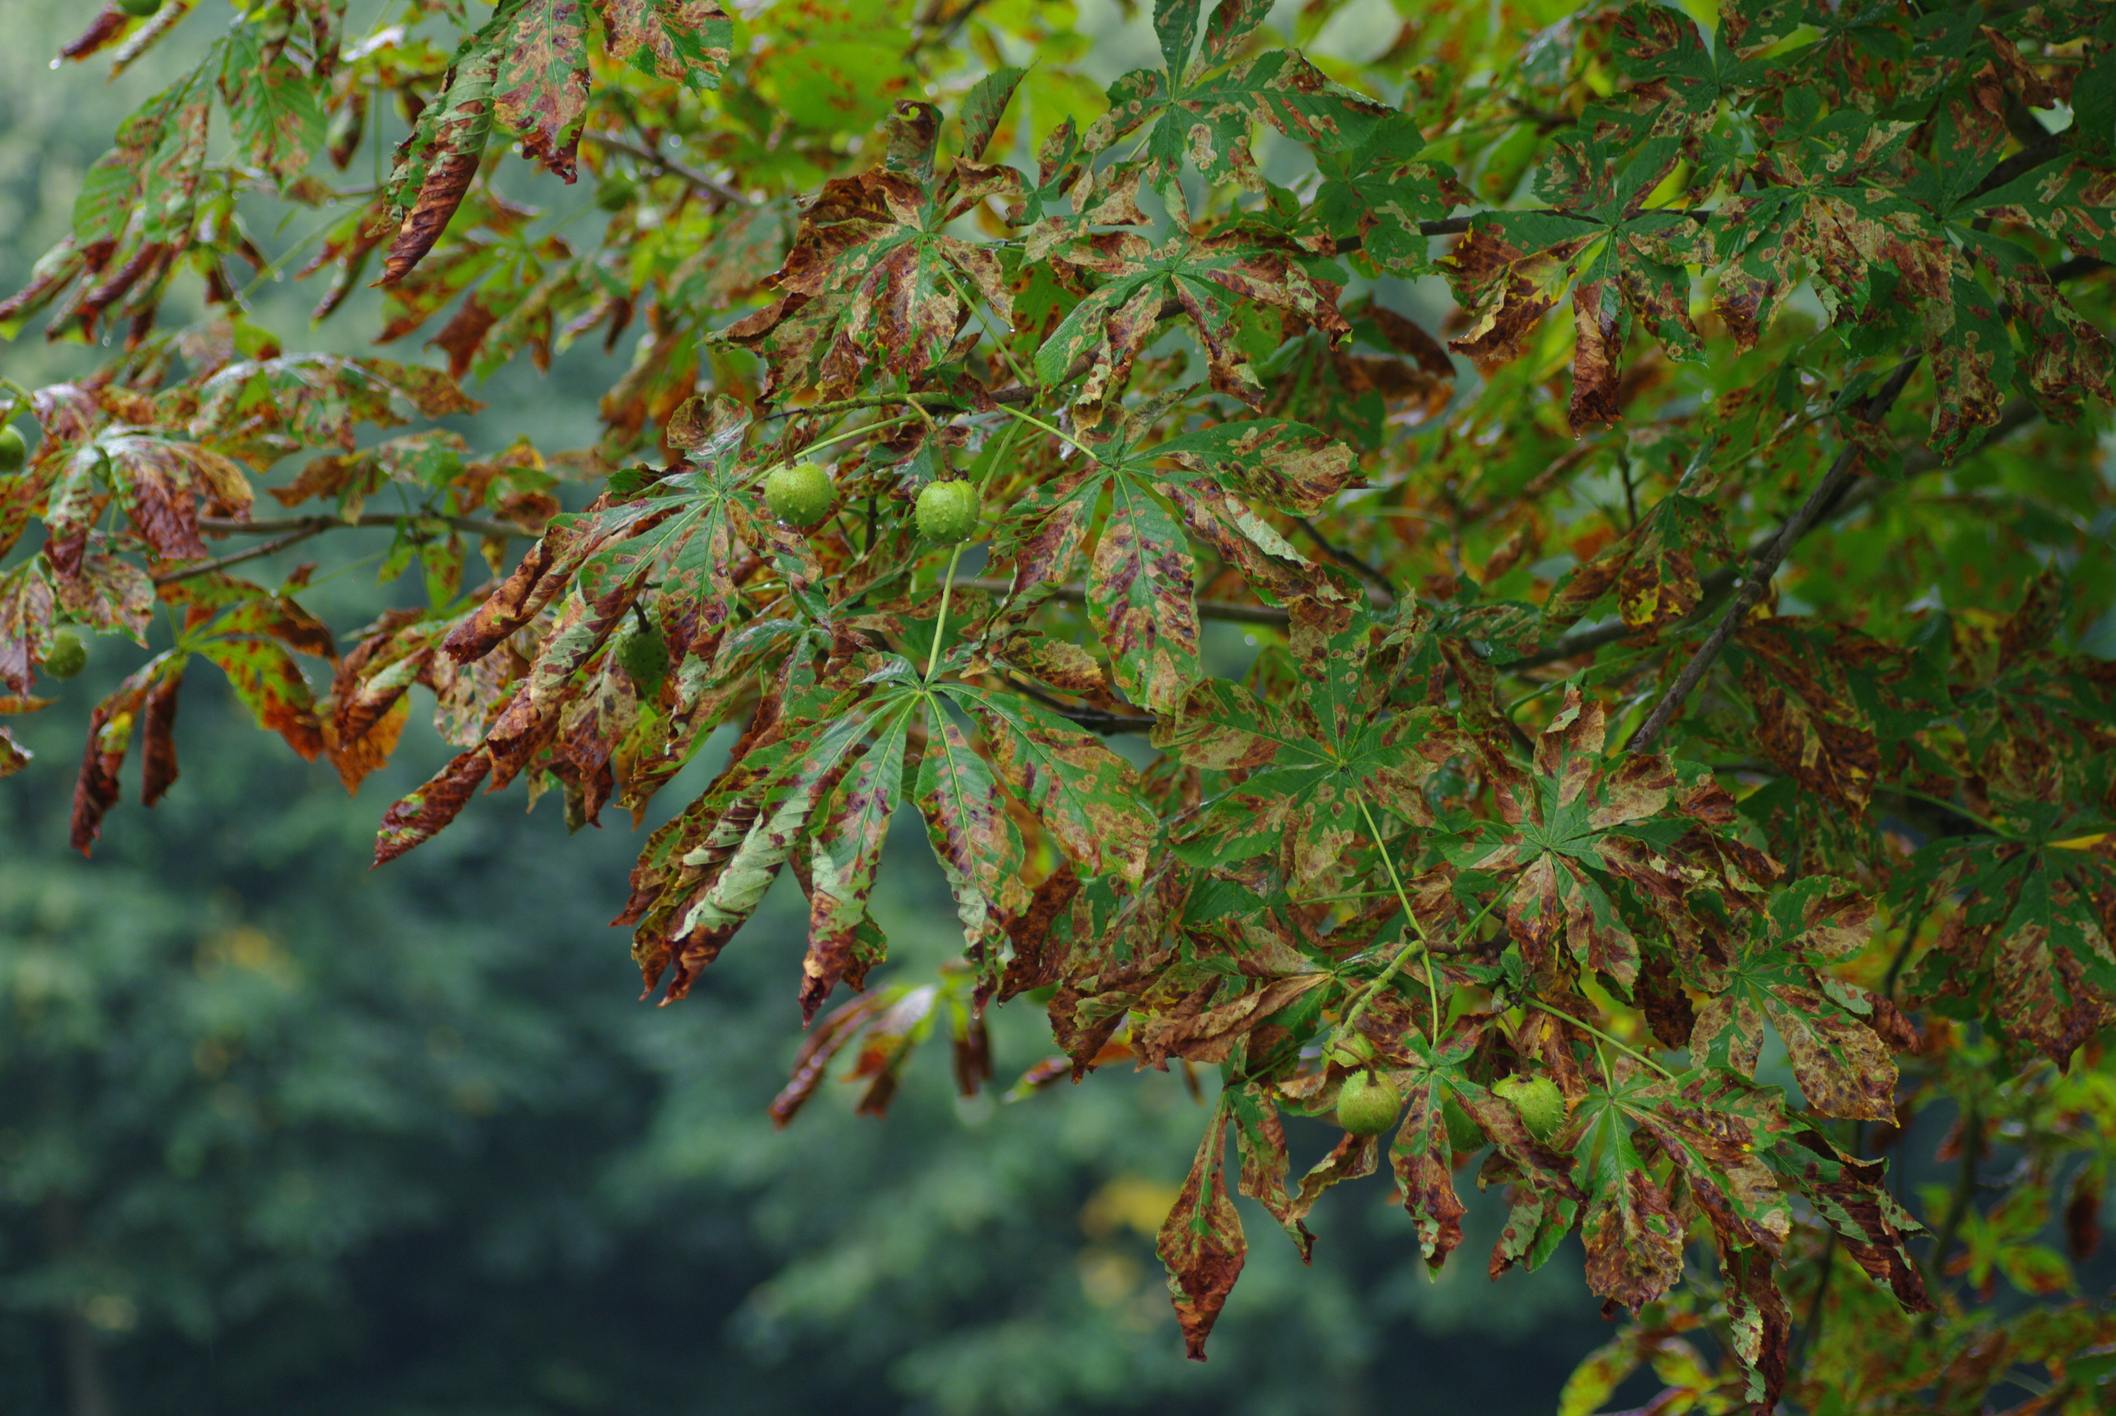 Diseased Tree